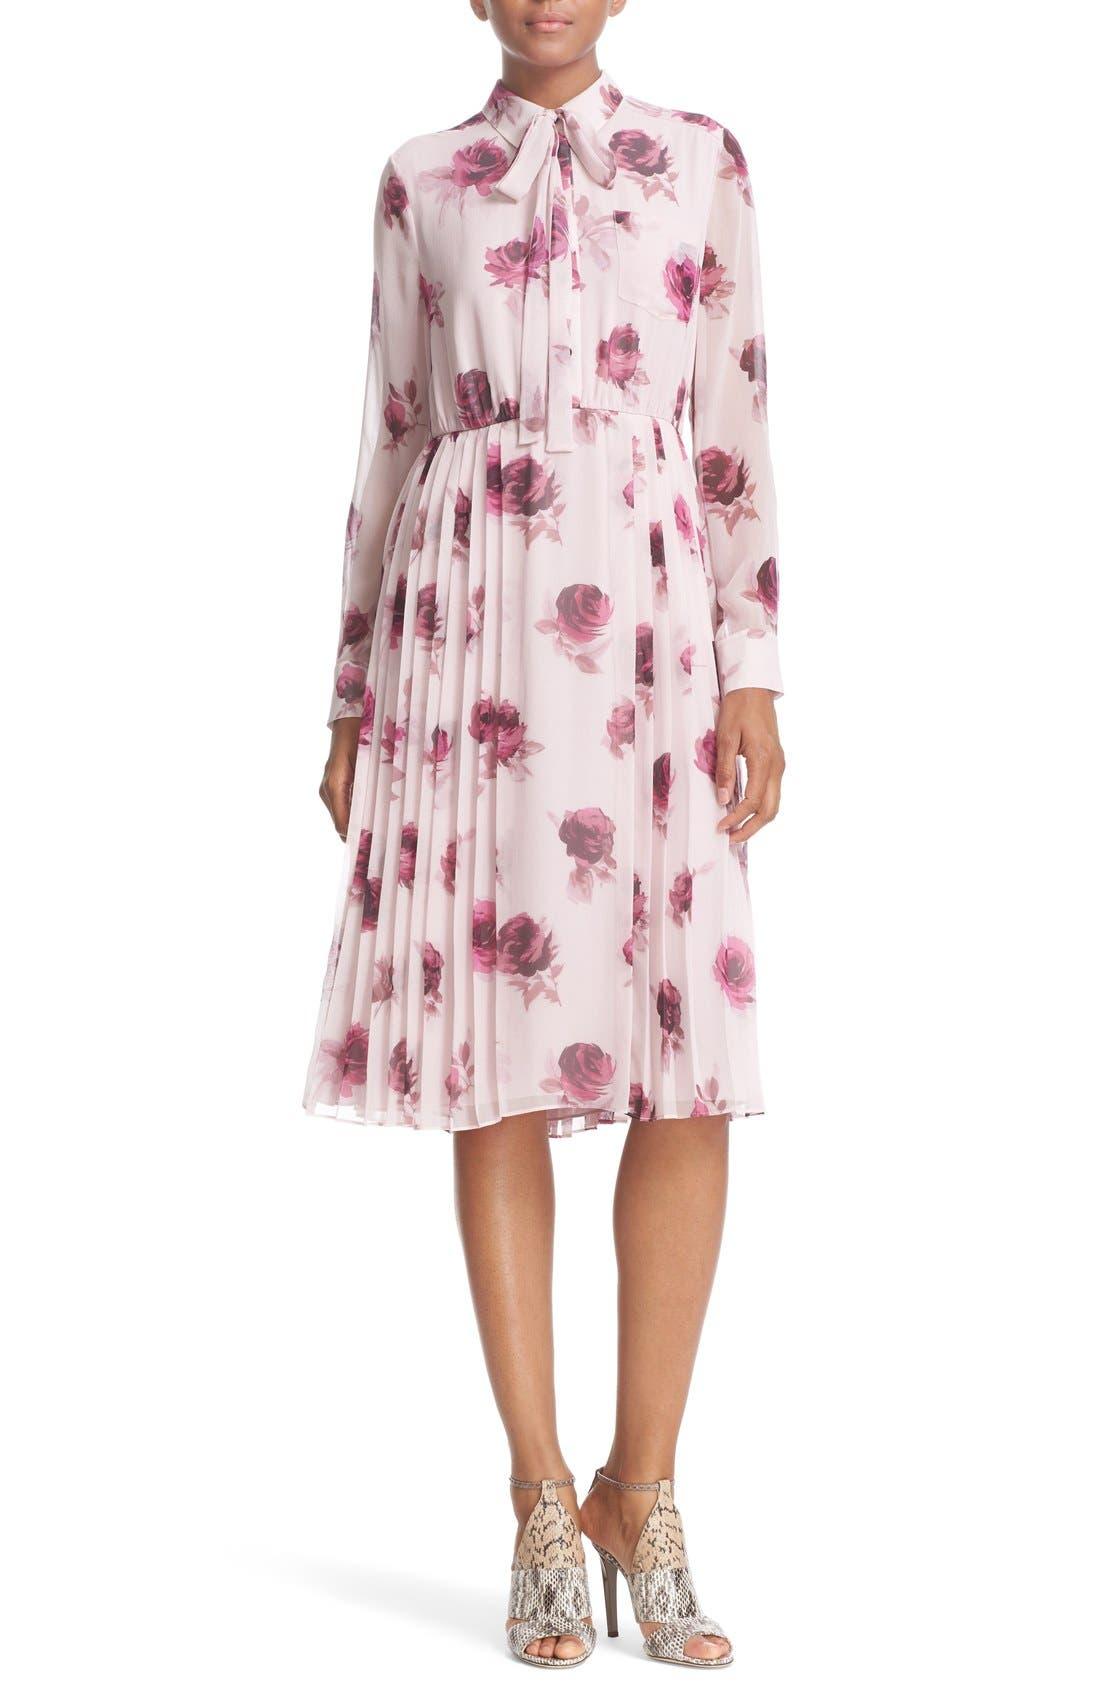 Alternate Image 1 Selected - kate spade new york 'encore rose' tie neck pleat chiffon dress